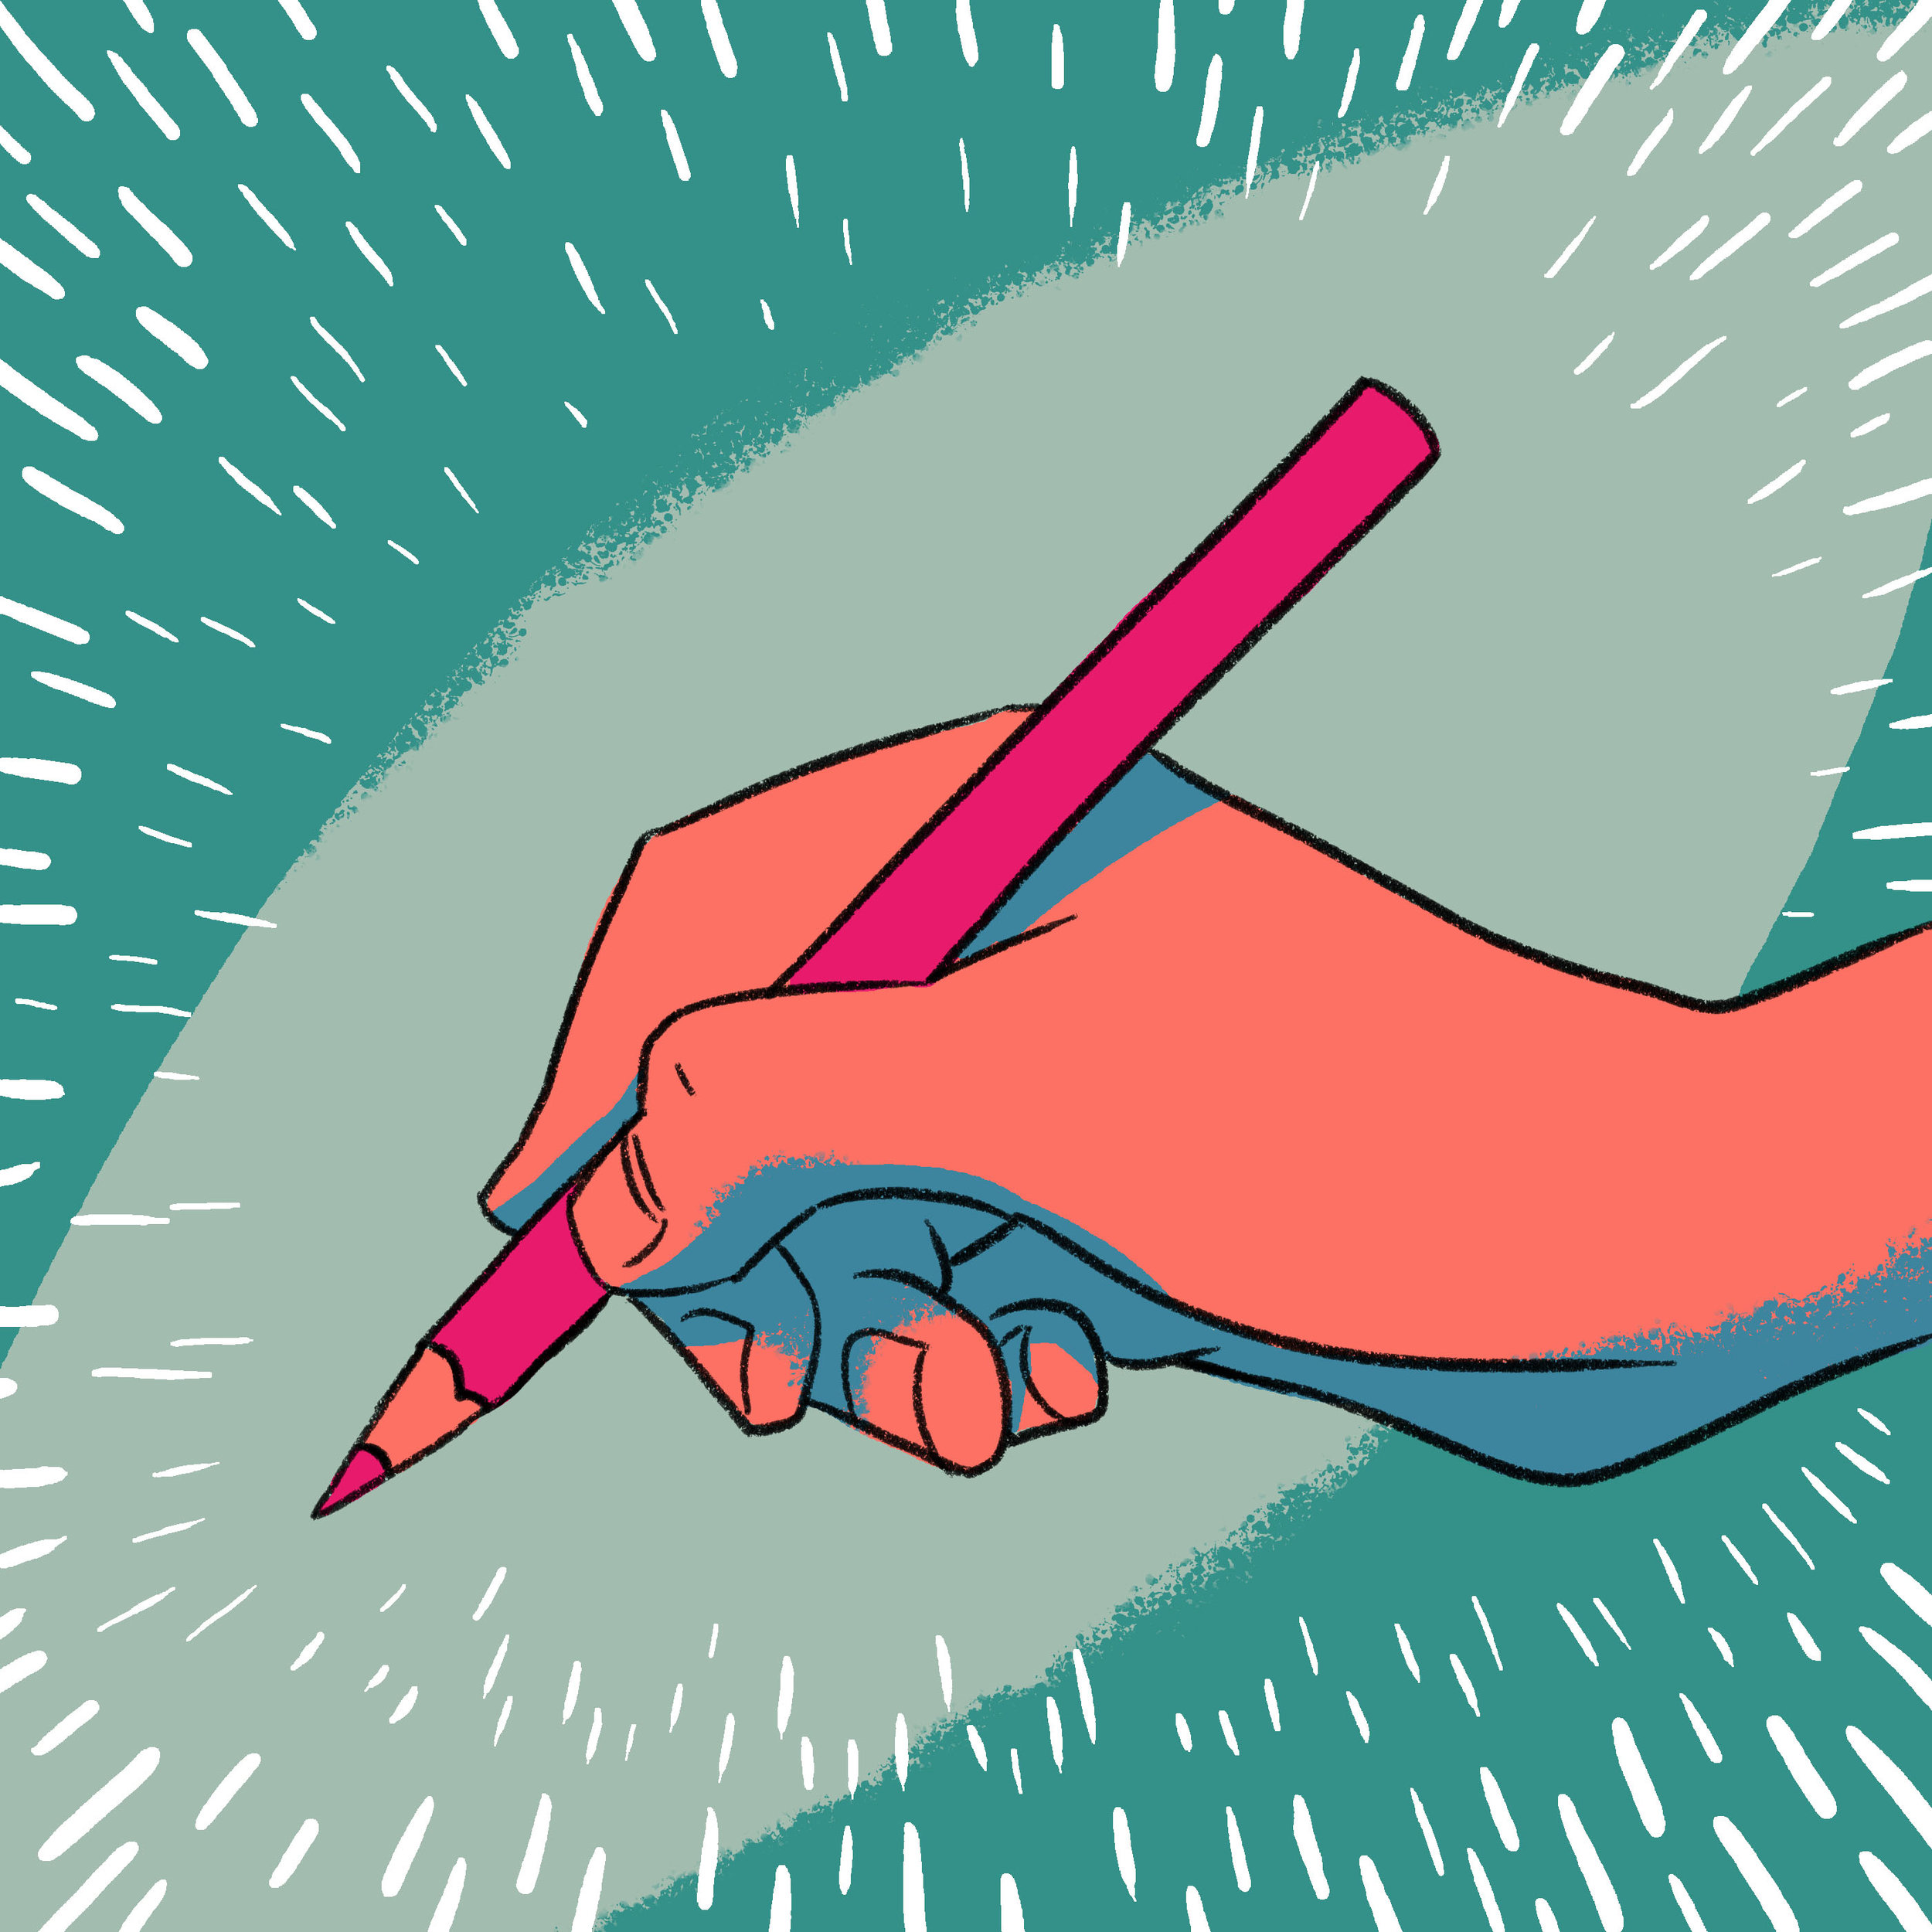 Scriberia Paper Pen Visual Notetaking Visual Thinking Illustration